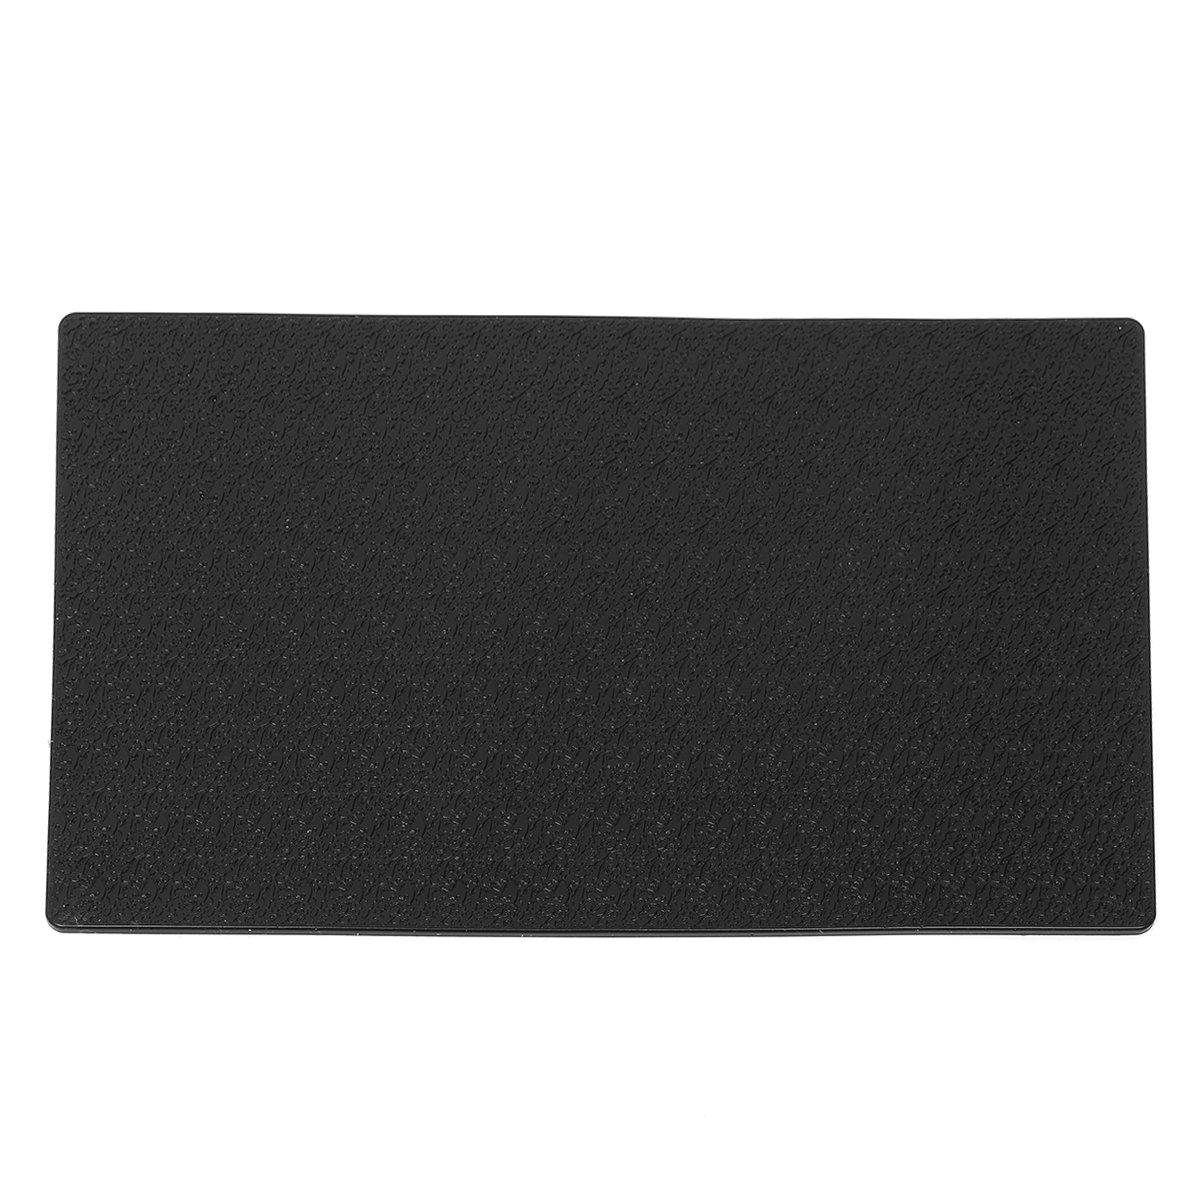 28x18cm Extra Large XL Sticky Pad Dashboard Mat Premium Anti-Slip Gel Pads